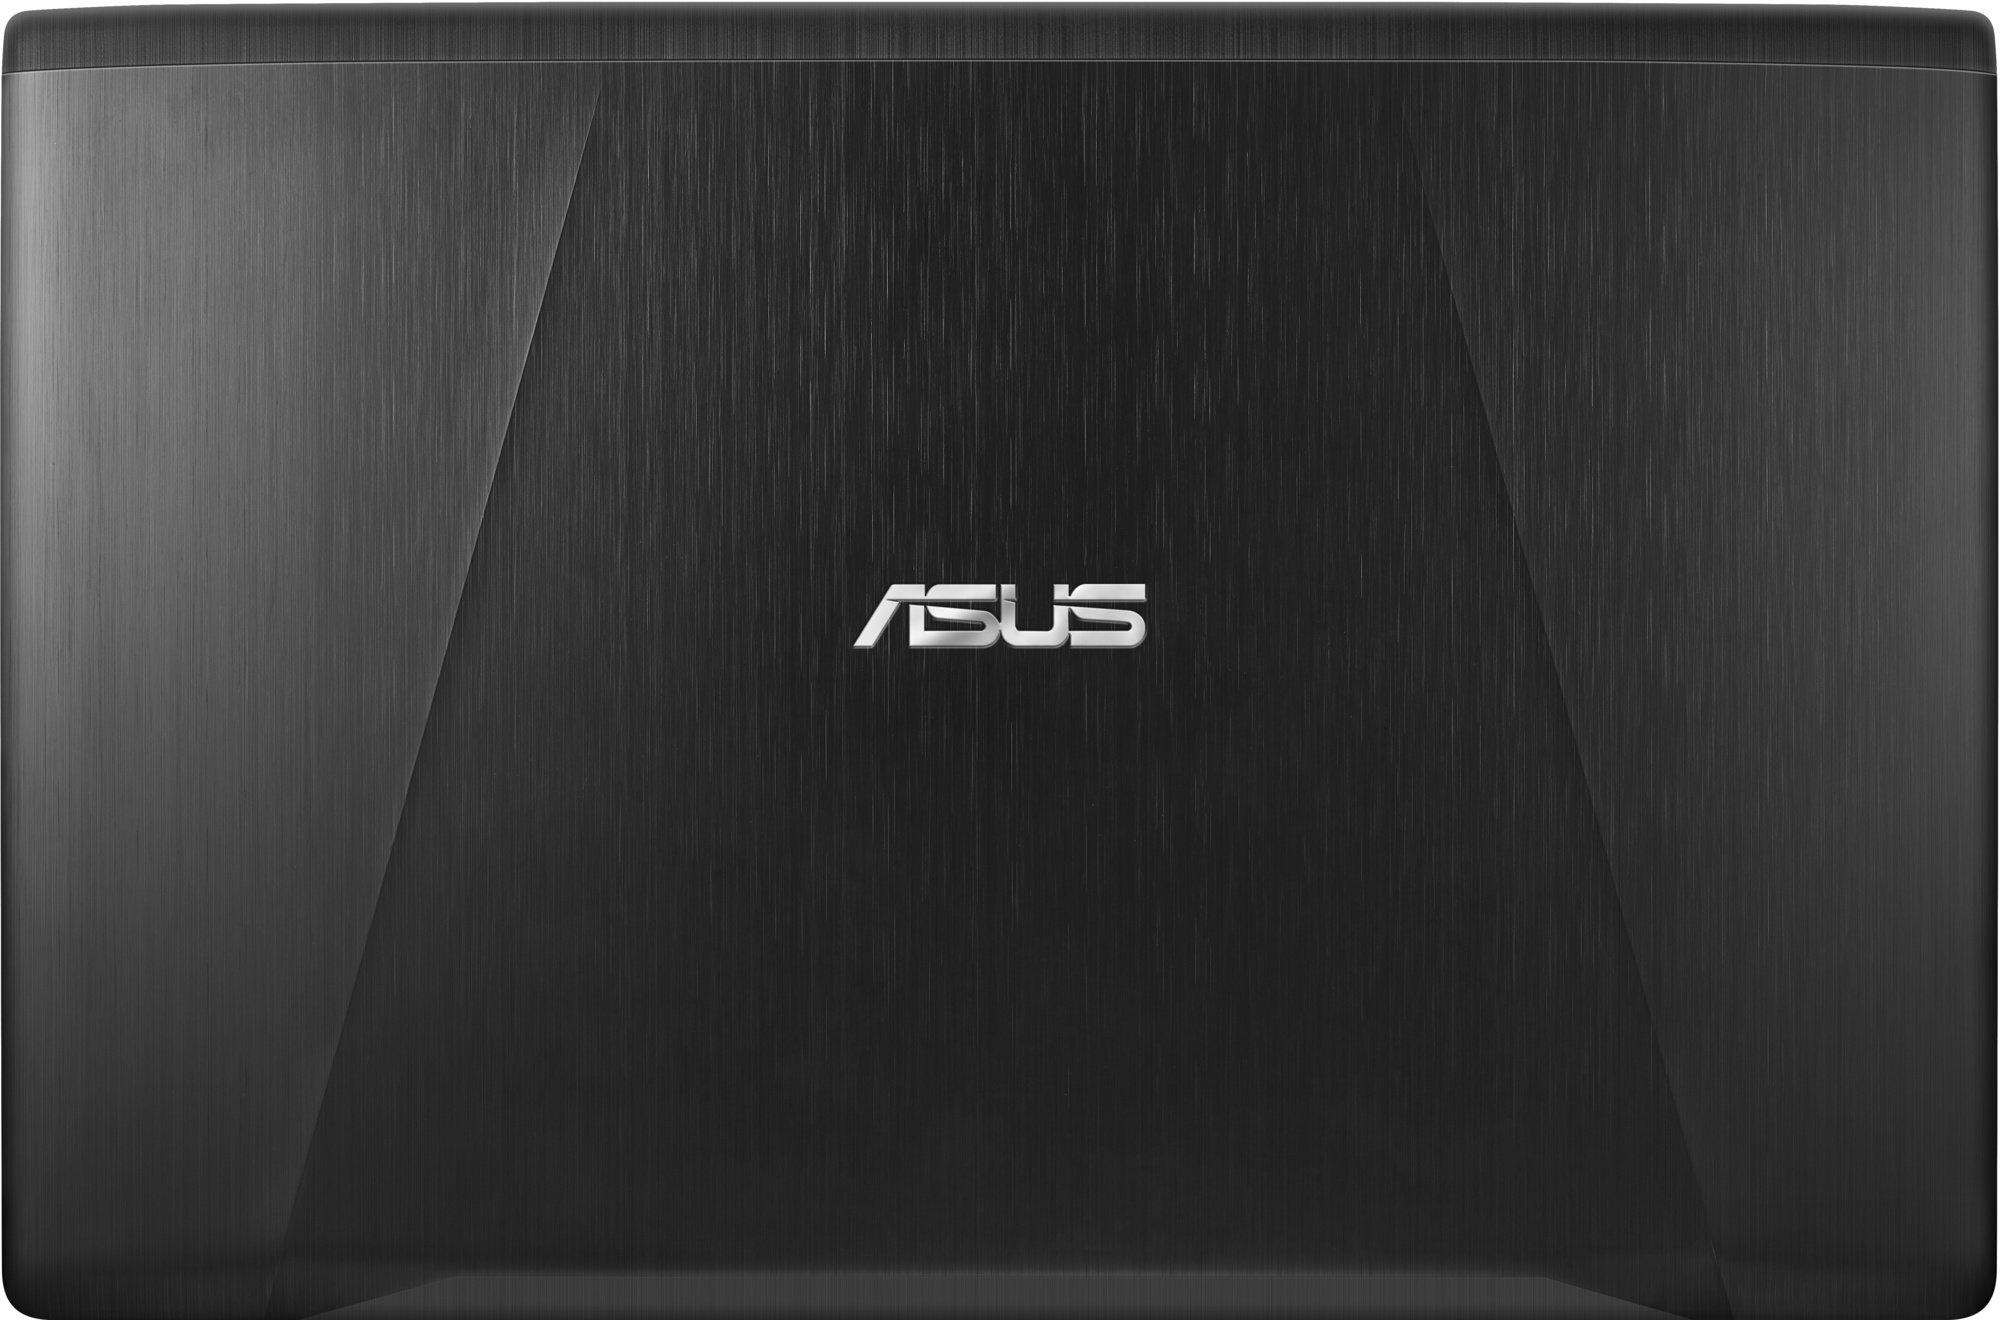 Asus ROG Strix FX753VD-GC256T